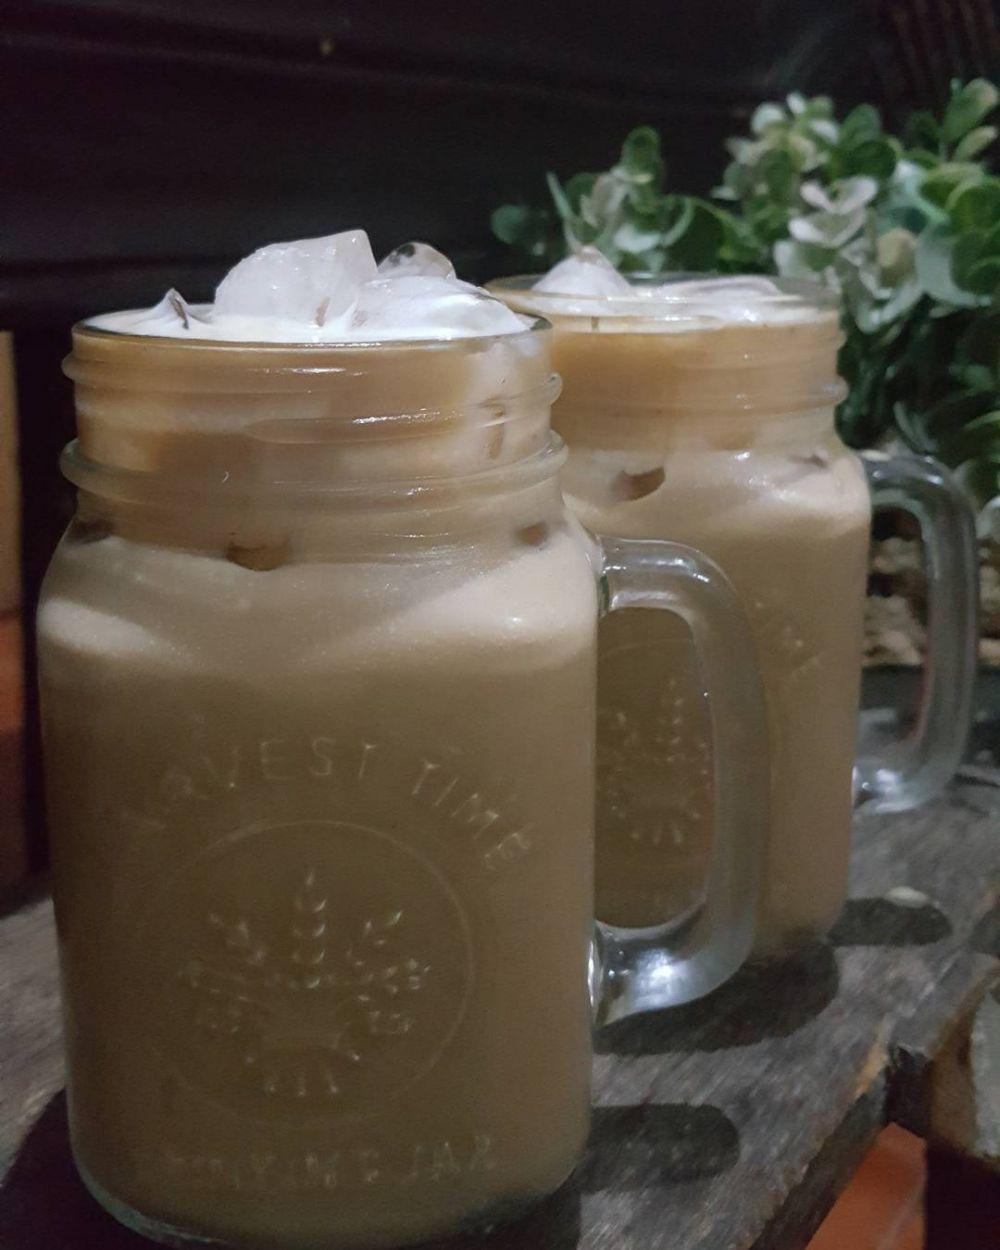 Resep minuman kopi ala kafe Instagram